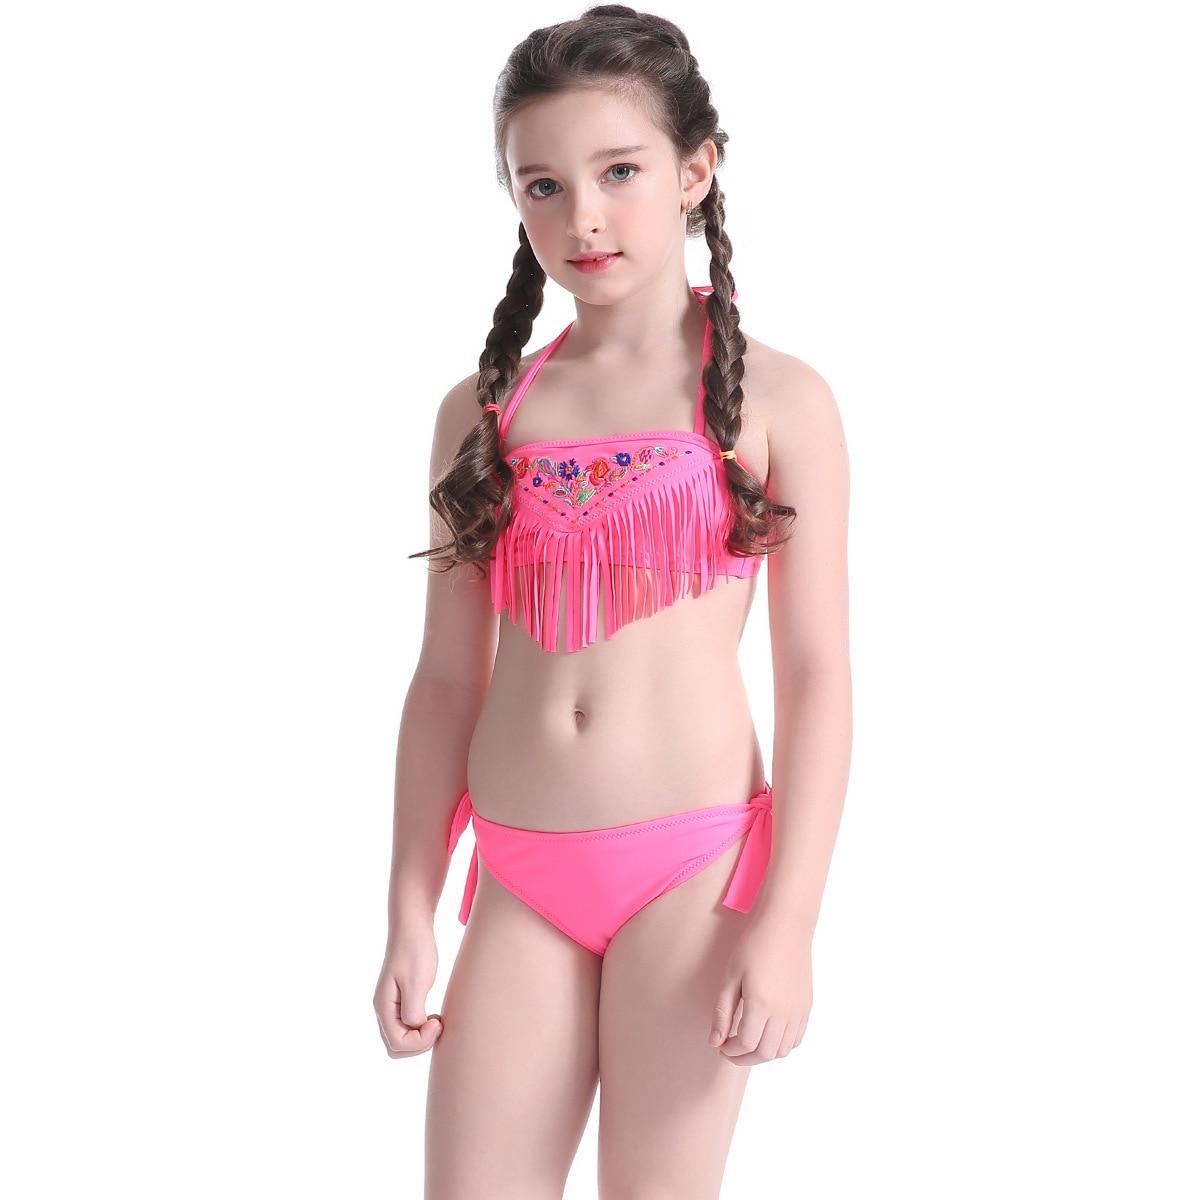 e7b53daef7 US $11.32 8% OFF|Girls Tassel Bikini Children Two Piece Swimsuit  Embroidering Floral Bikinis Sets for Teenagers Kids Swimwear Beach Bathing  Suit-in ...